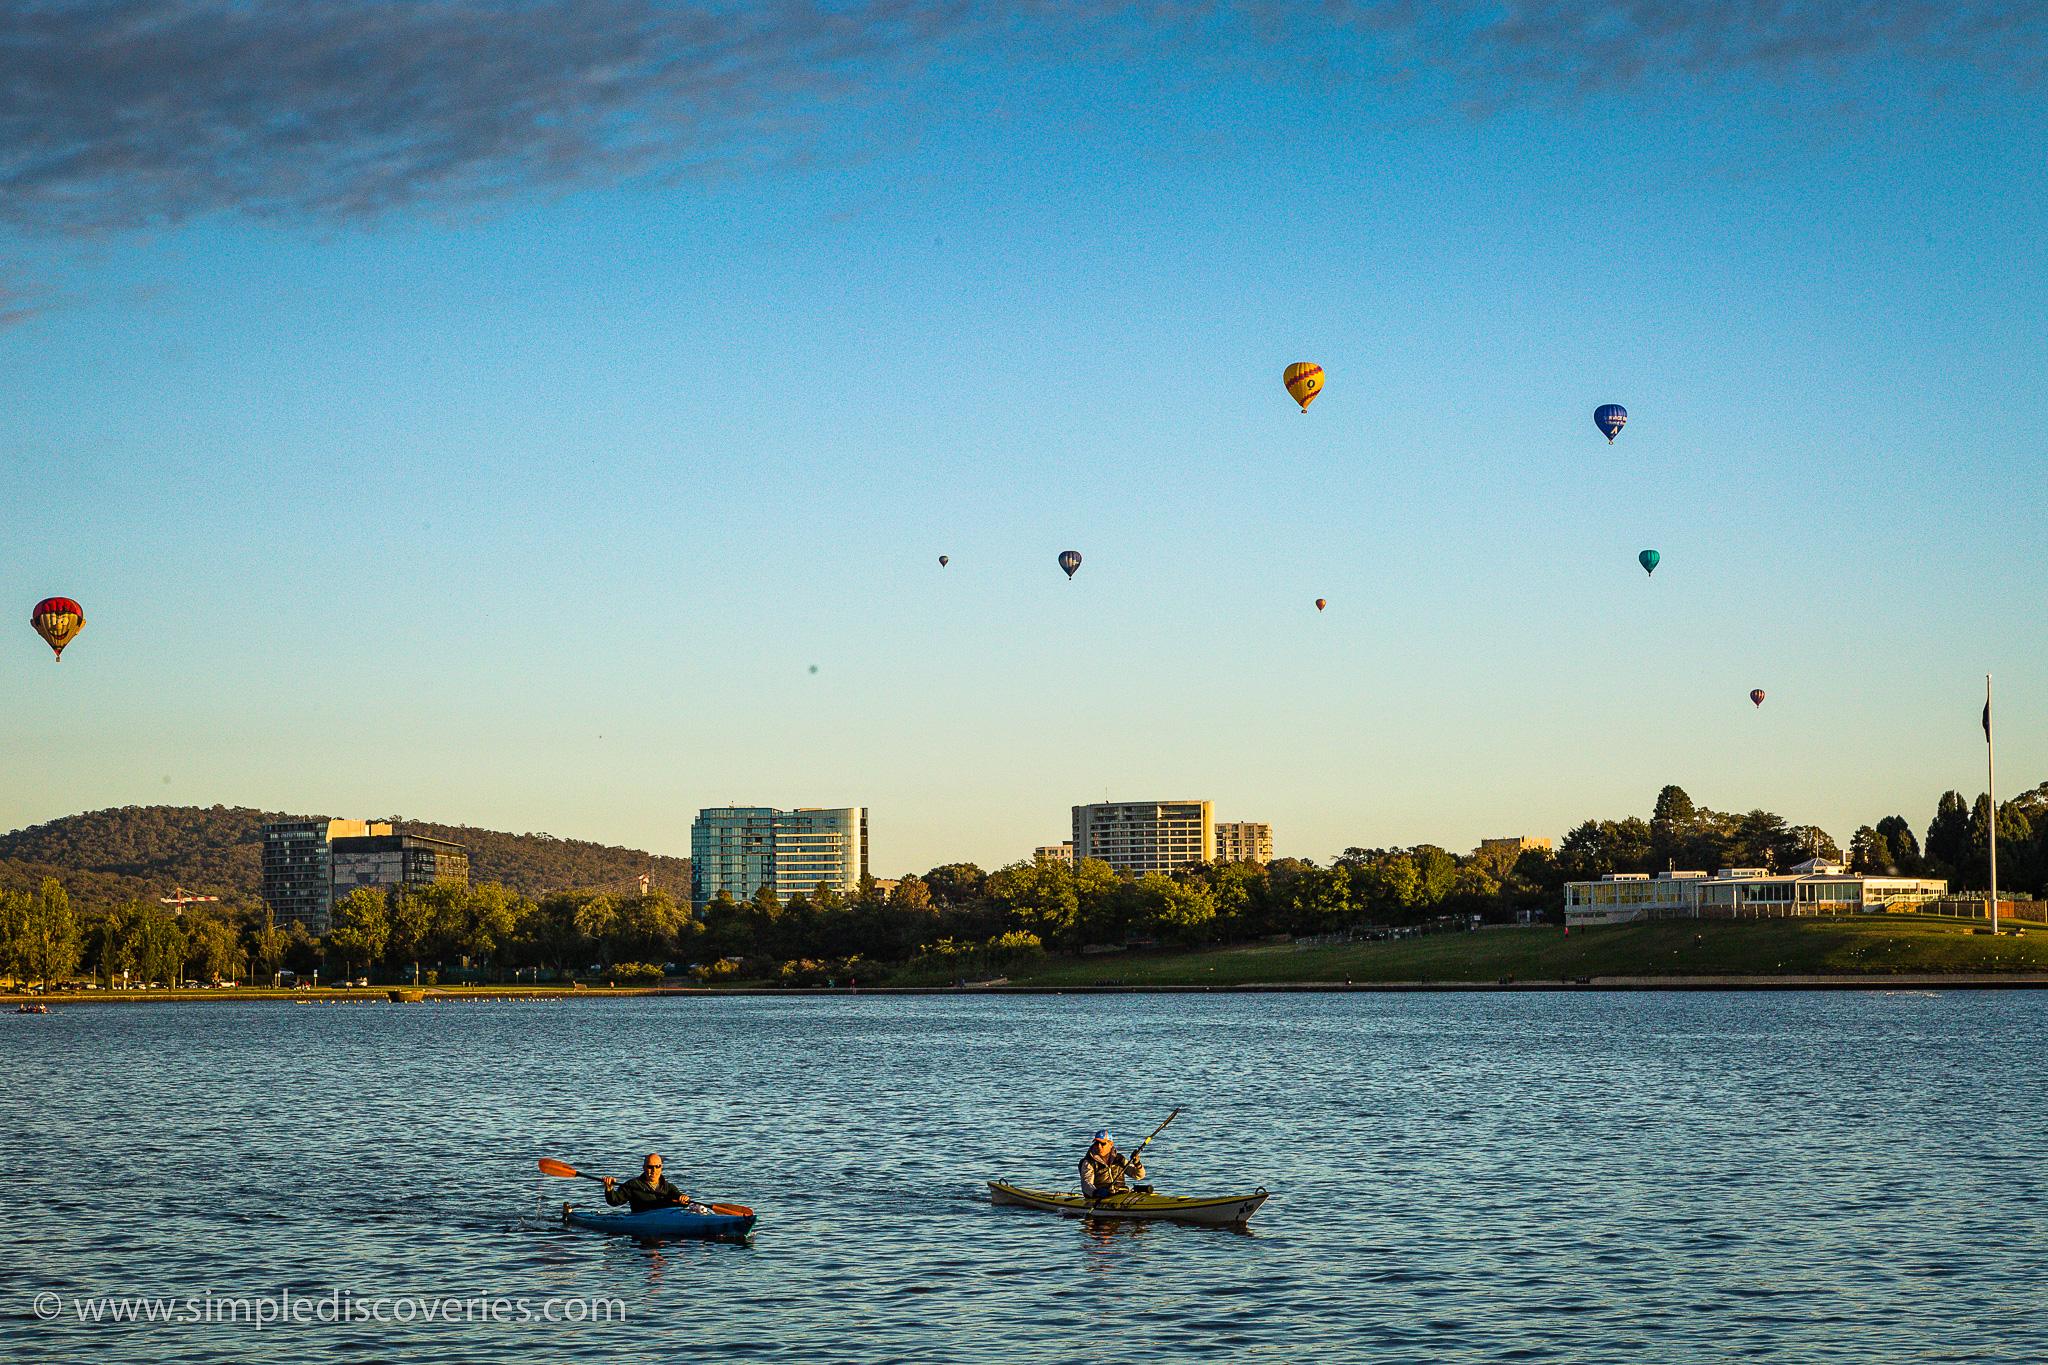 canberra_australia_balloons_kayaking